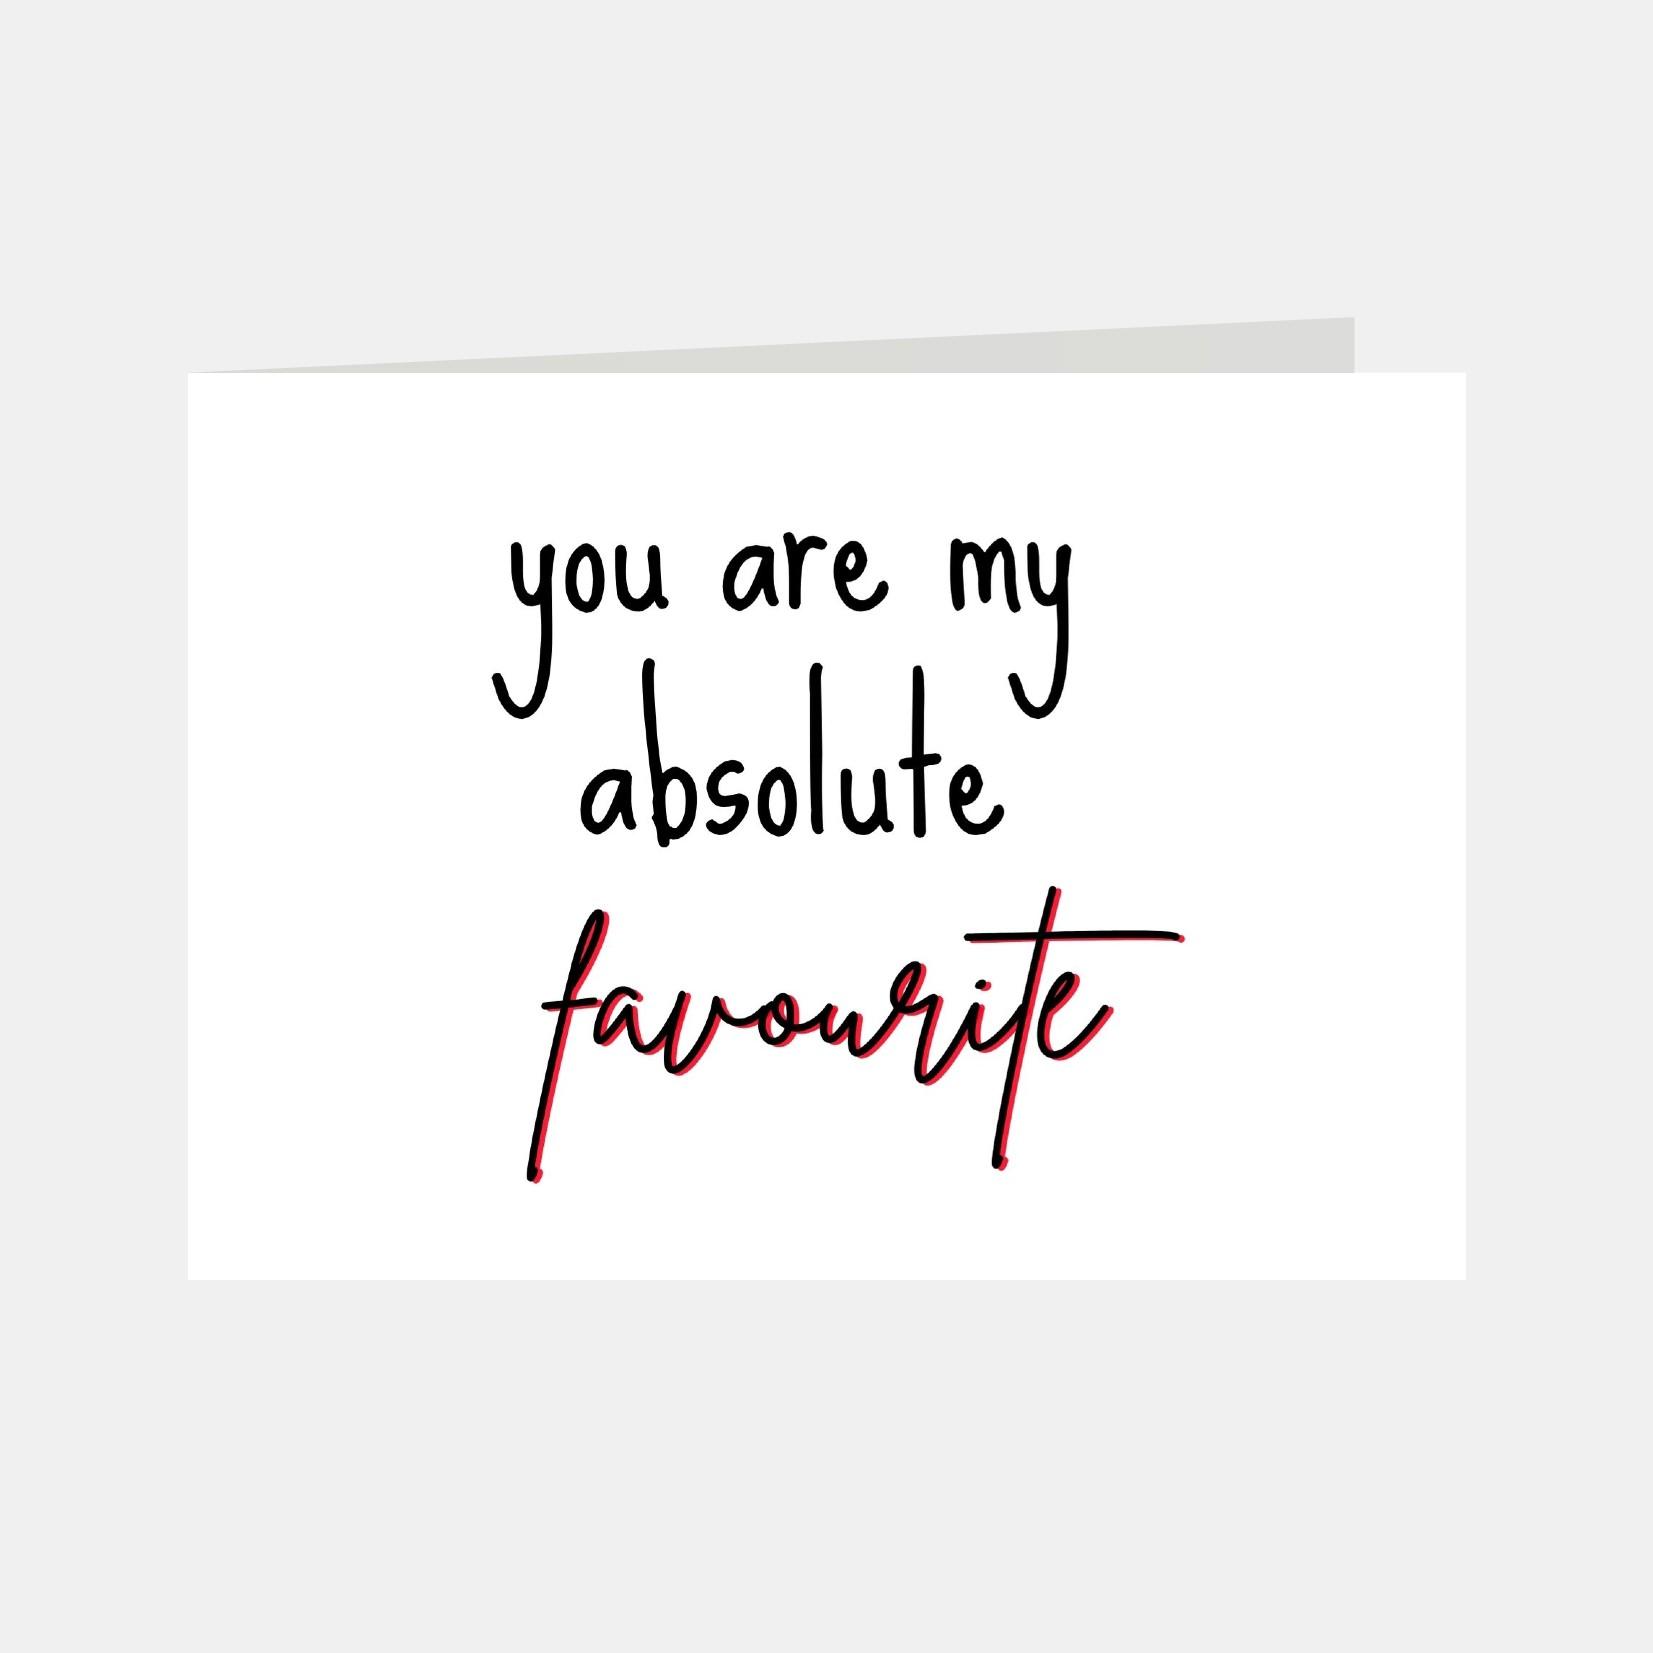 Wenskaart met de tekst you are my absolute favourite